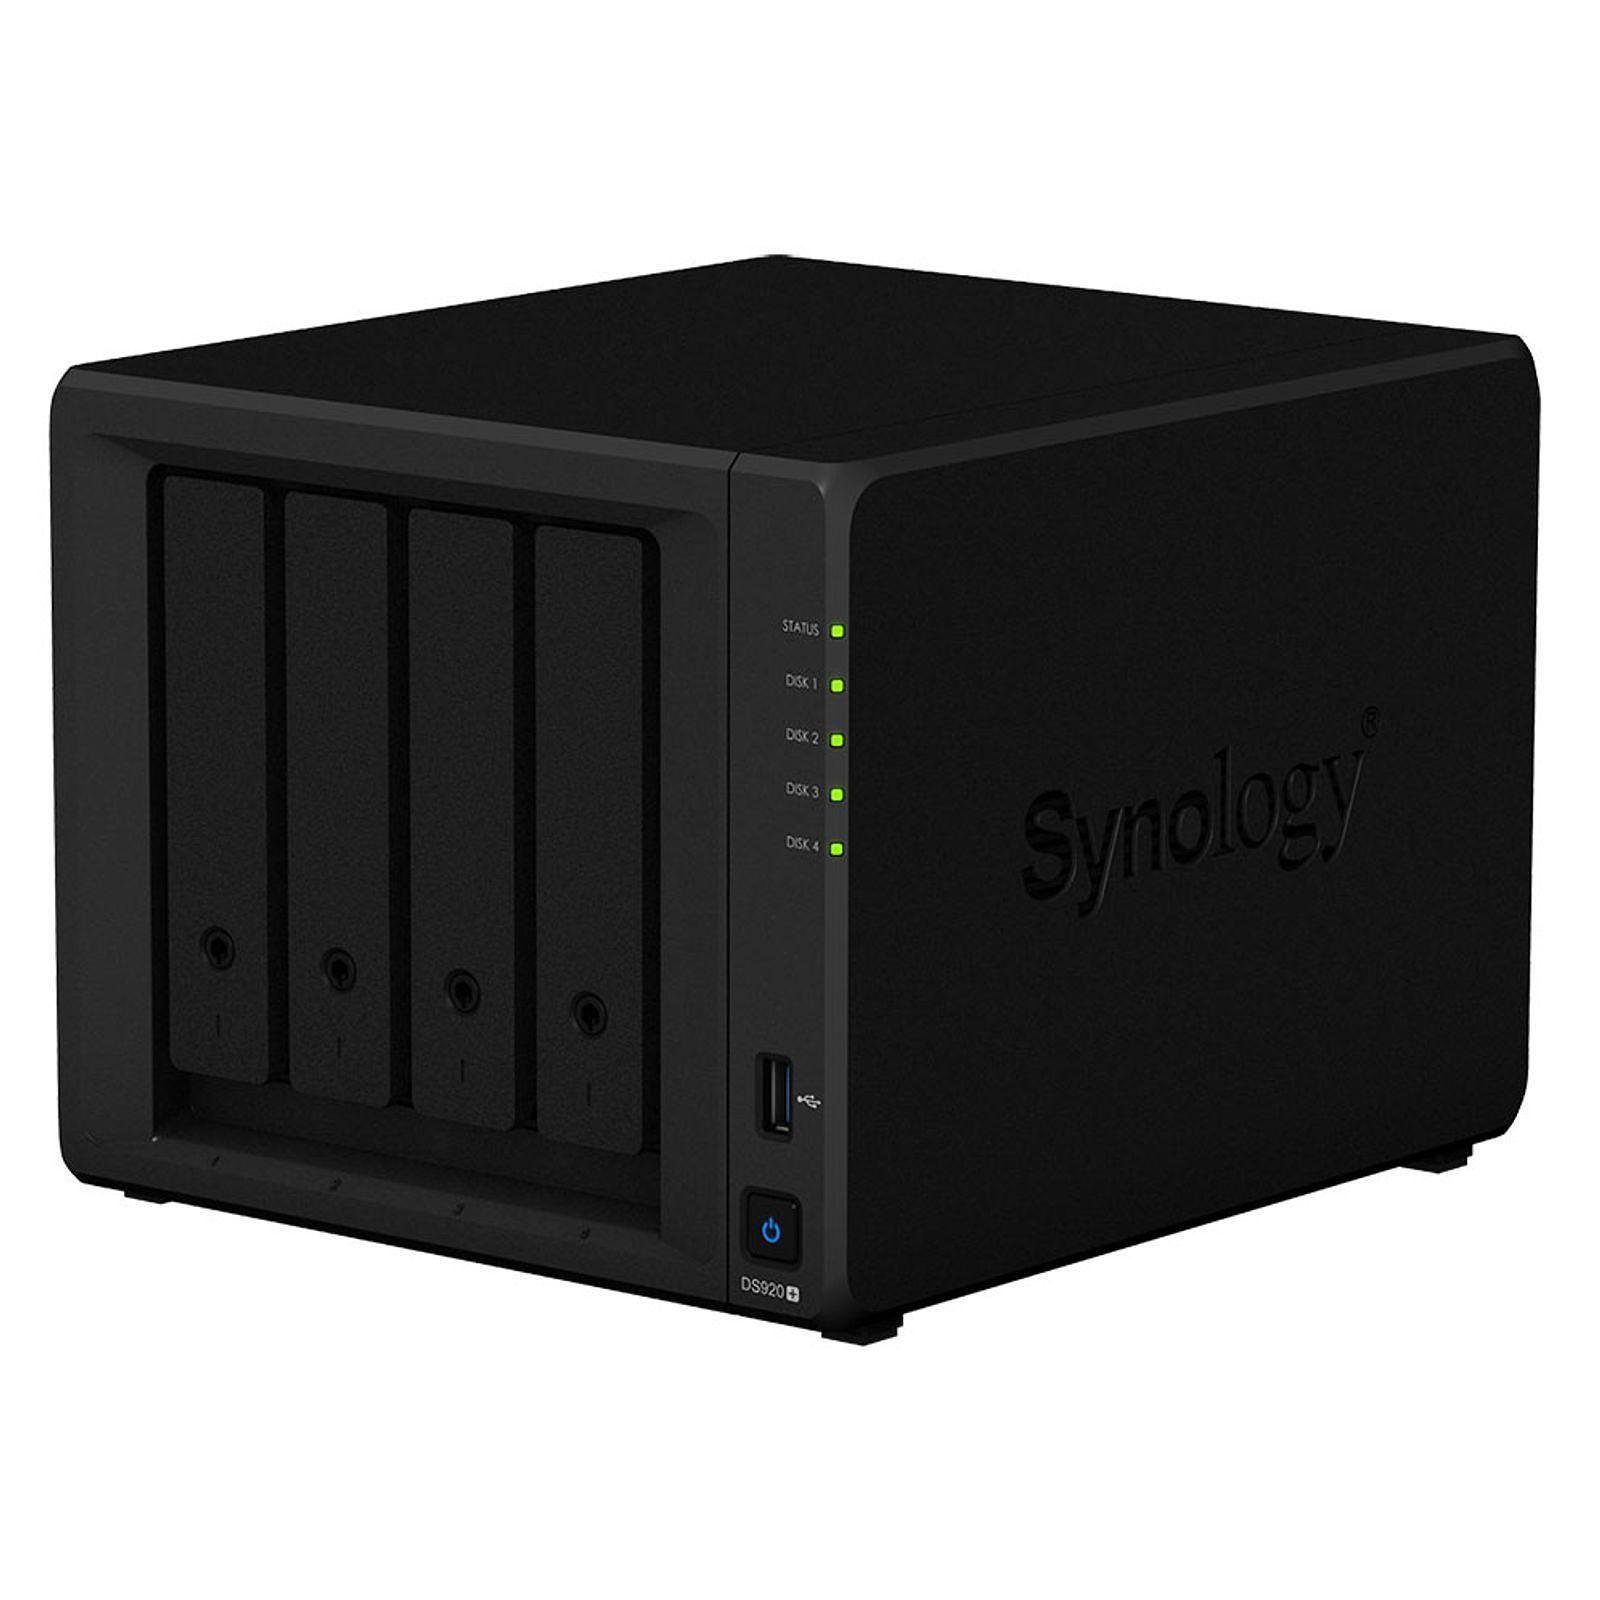 Synology DS920+ - 4 HDD - Serveur NAS Synology - Cybertek.fr - 3